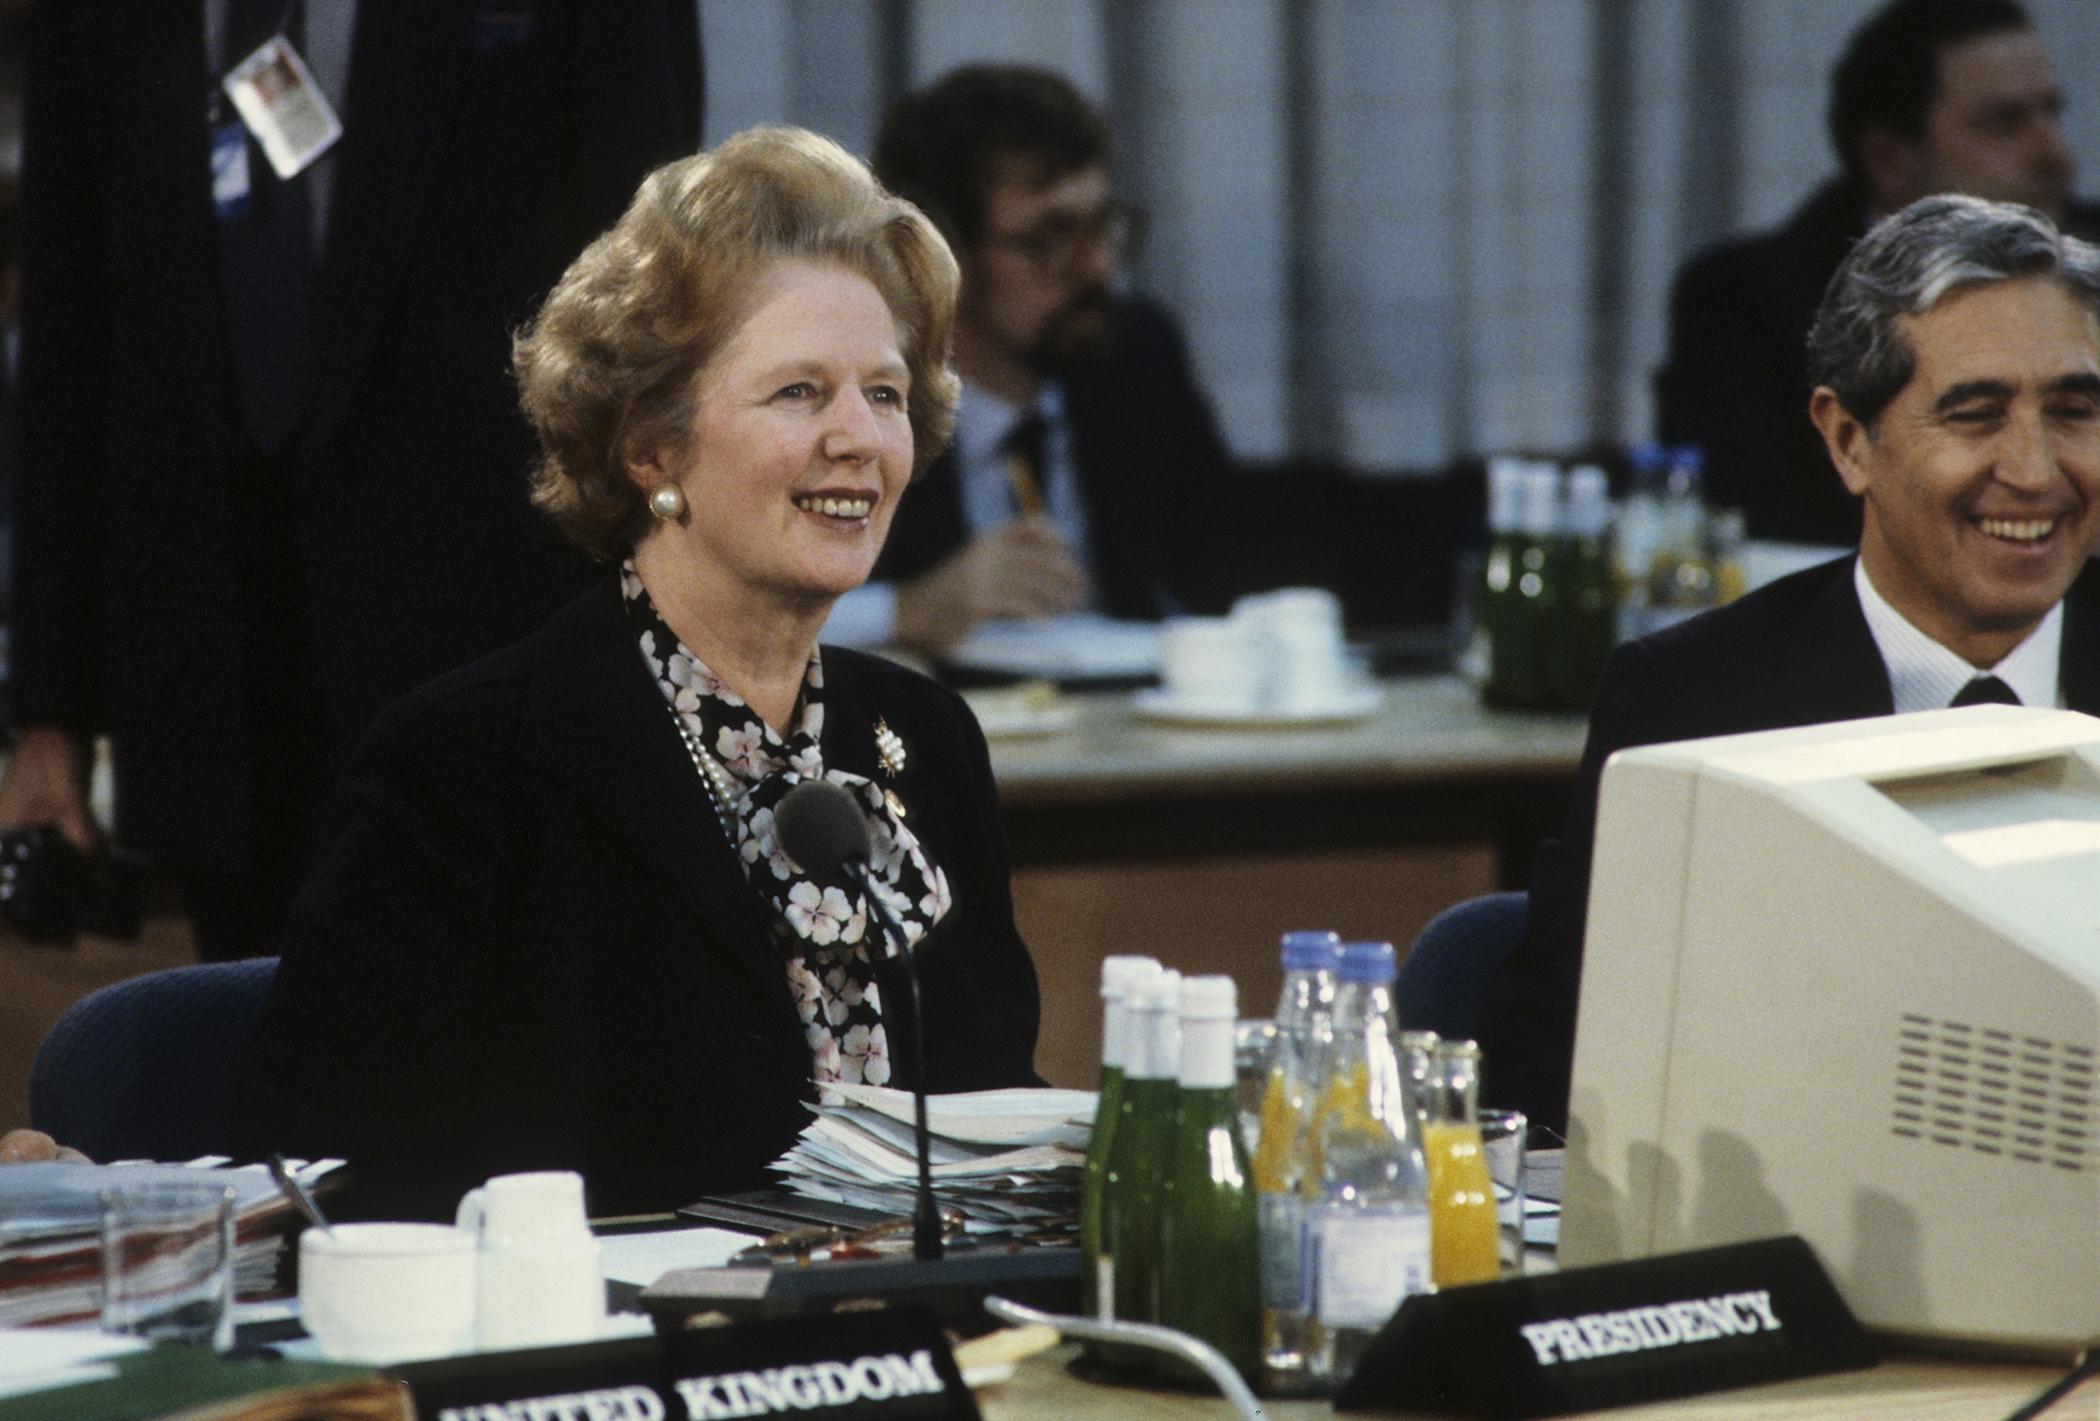 British Prime Minister Margaret Thatcher during an EEC summit in London, 6th December 1986.